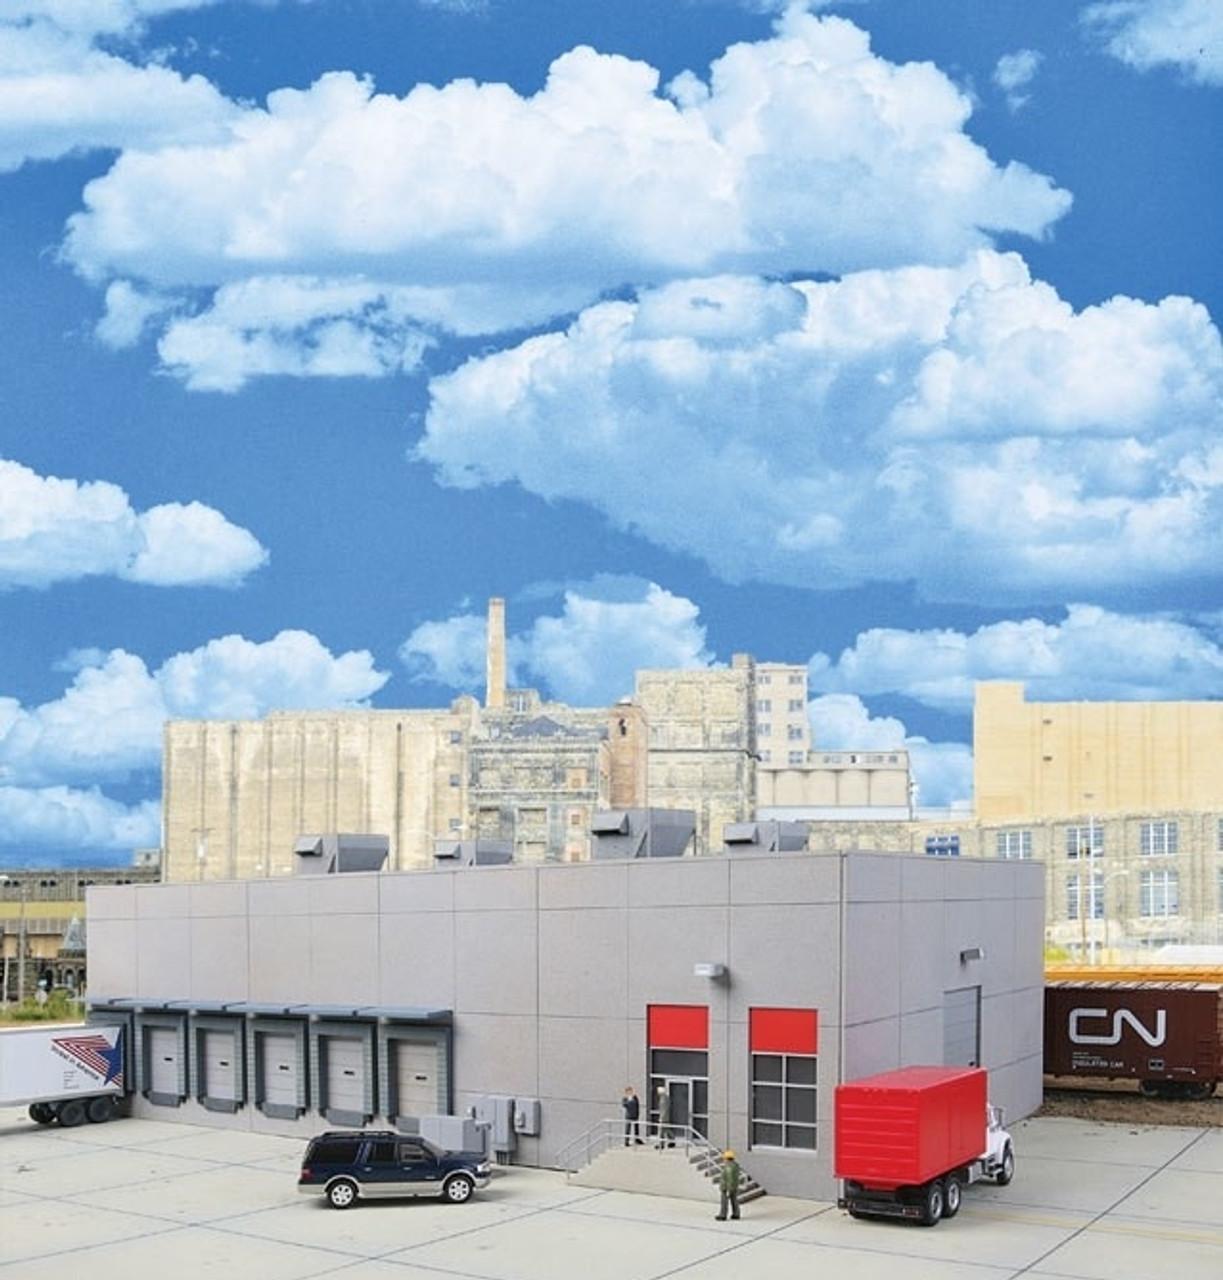 4067 Walthers Cornerstone Modern Concrete Factory Distribution Warehouse HO